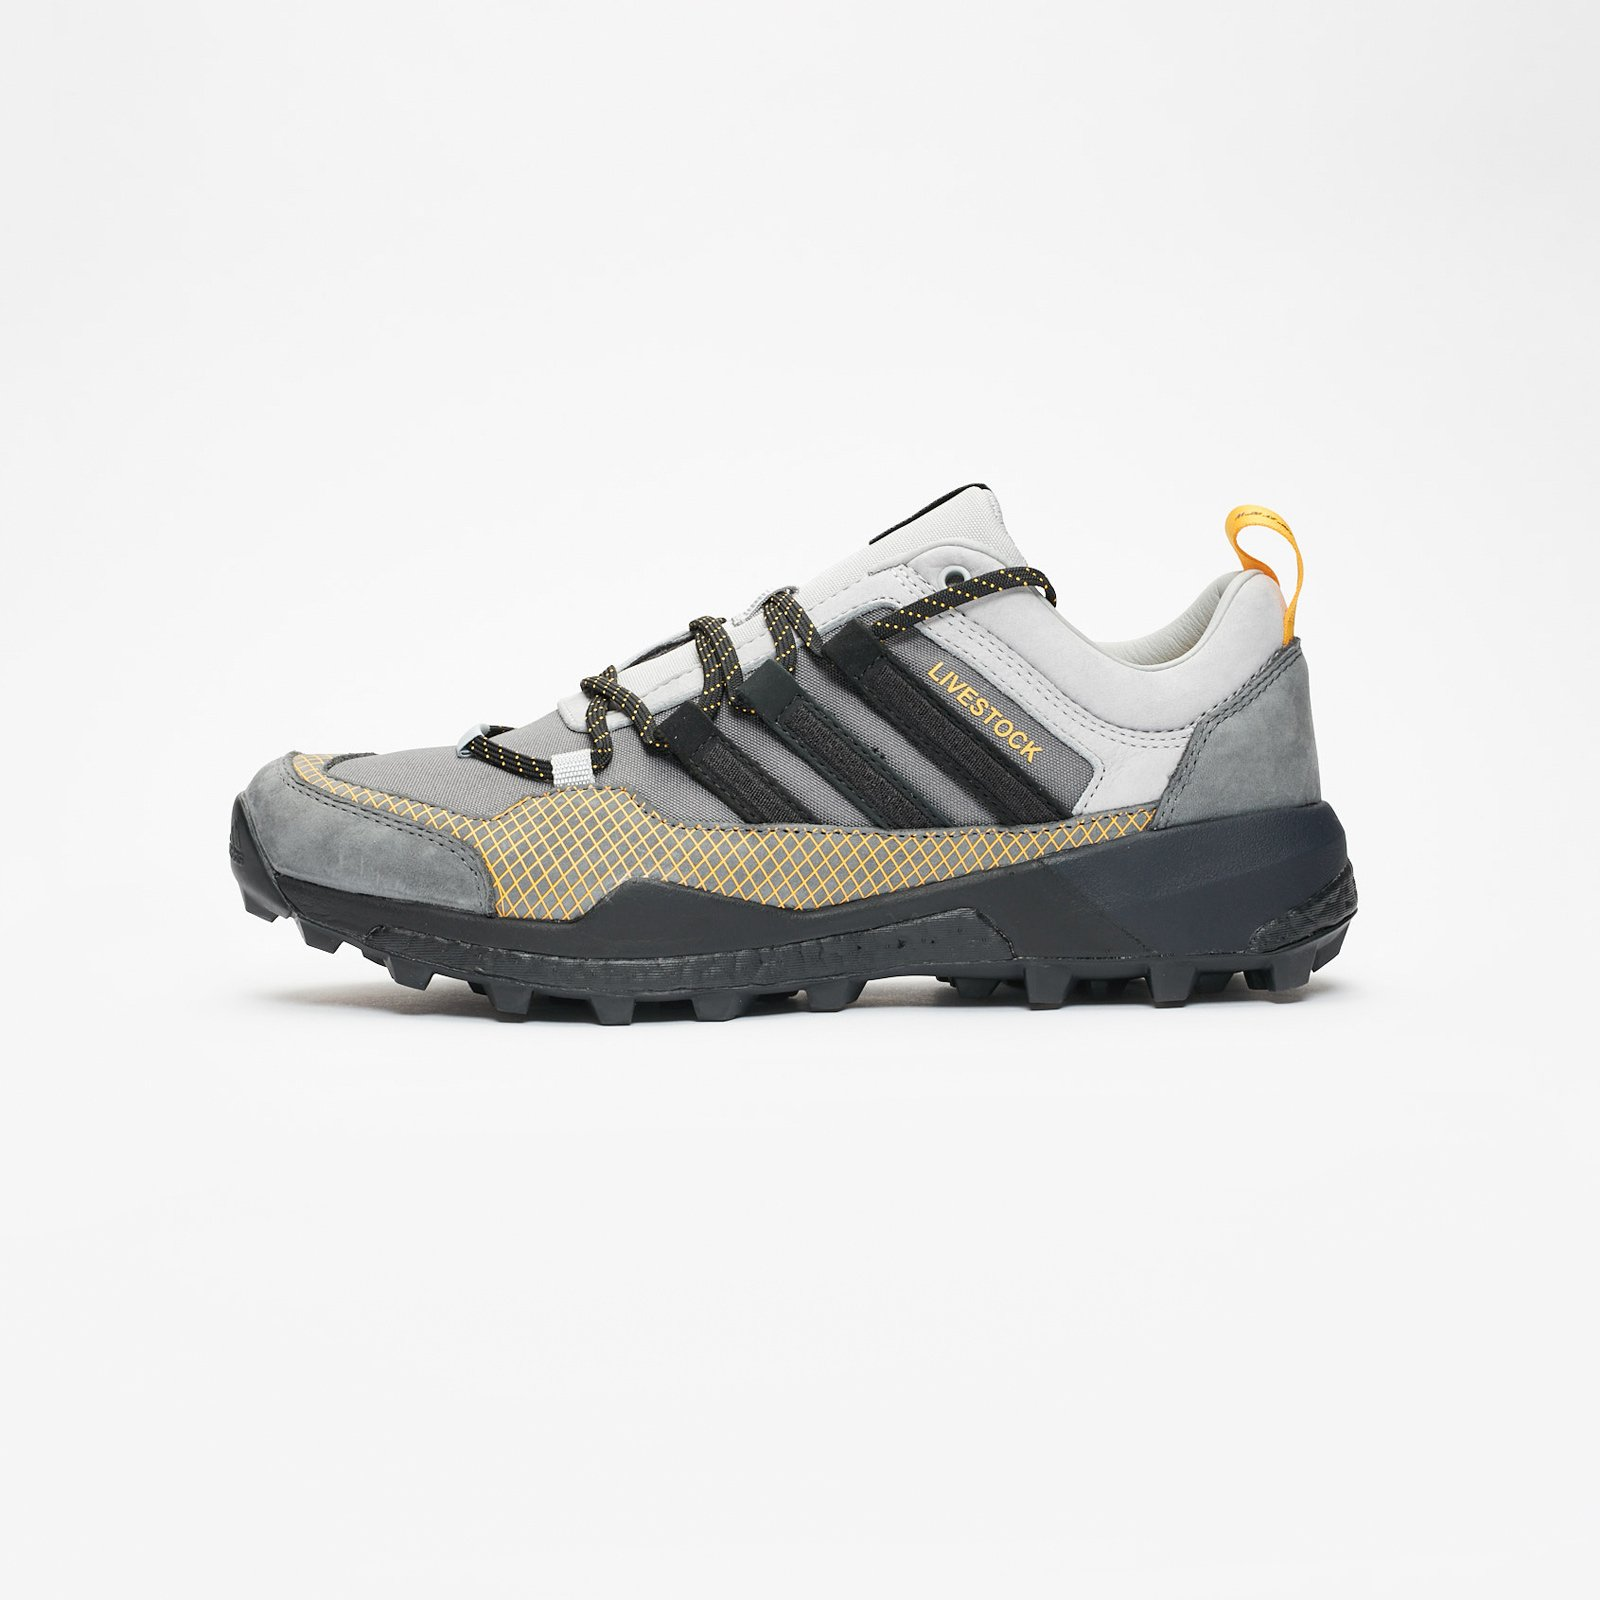 1c88ae8eef5 adidas Terrex Skychaser LIVESTOCK - B37853 - Sneakersnstuff ...